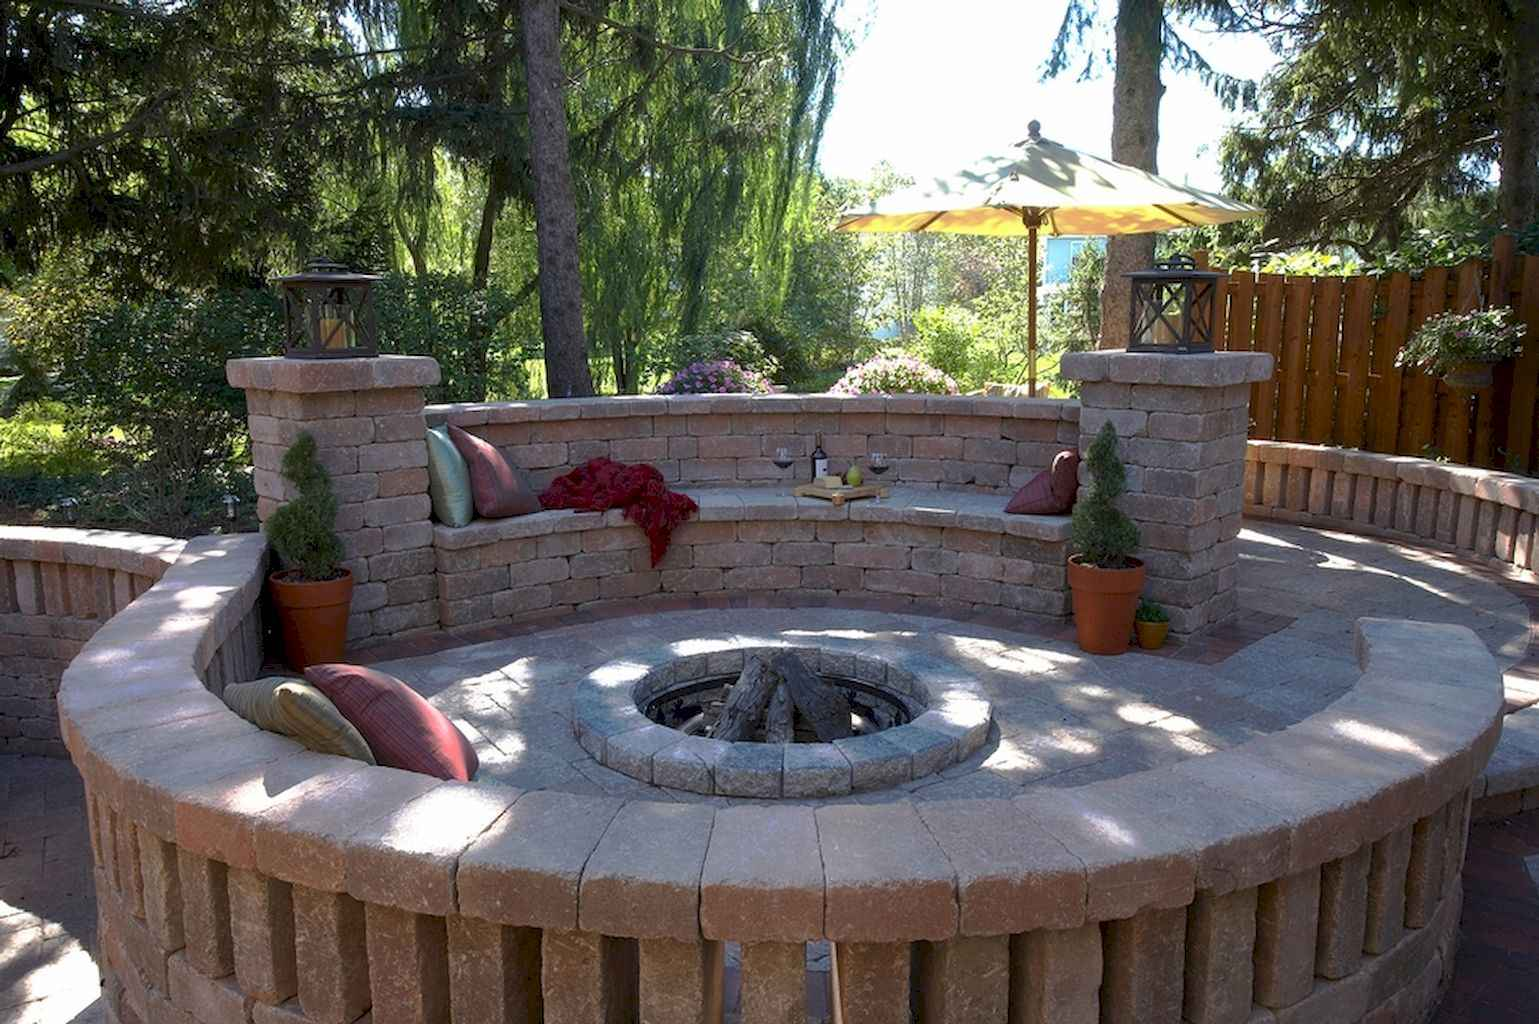 60 Beautiful Backyard Fire Pit Ideas Decoration and Remodel (54)